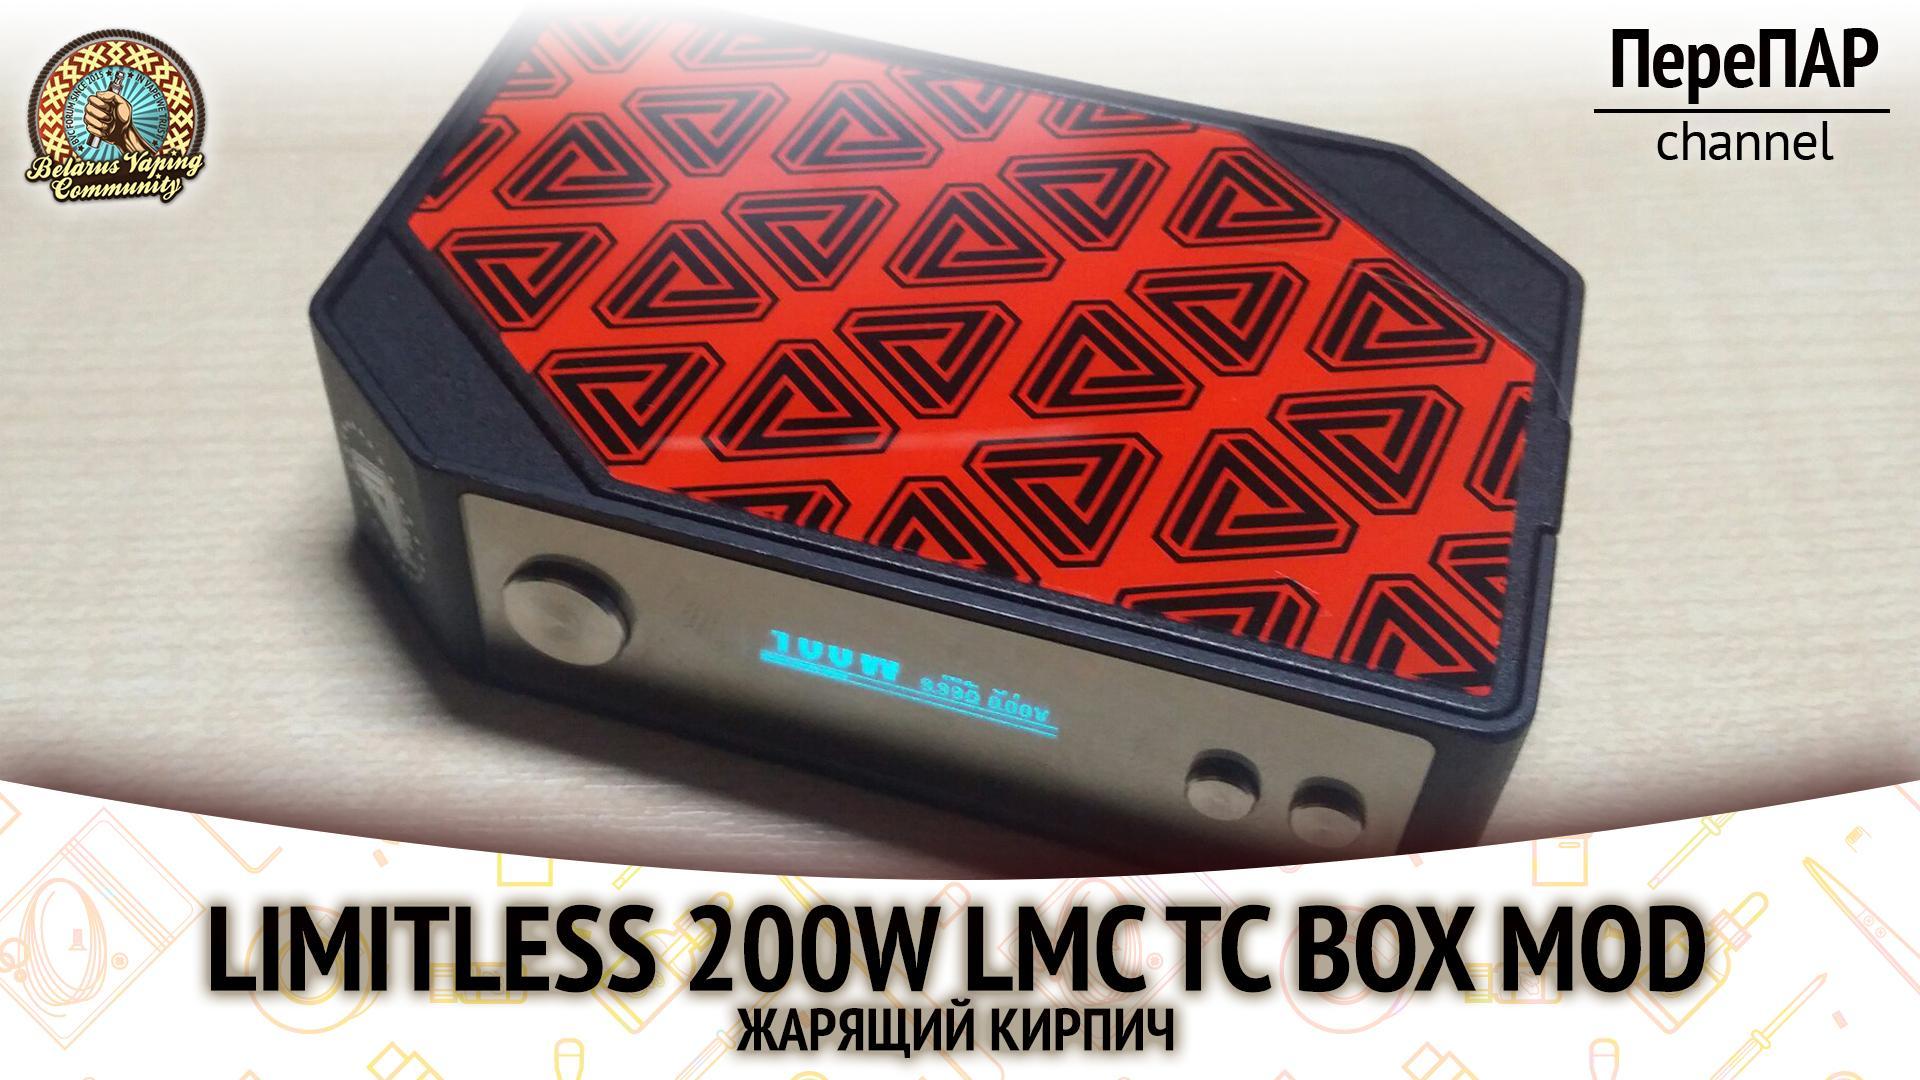 Видеообзор боксмода Limitless 200W LMC